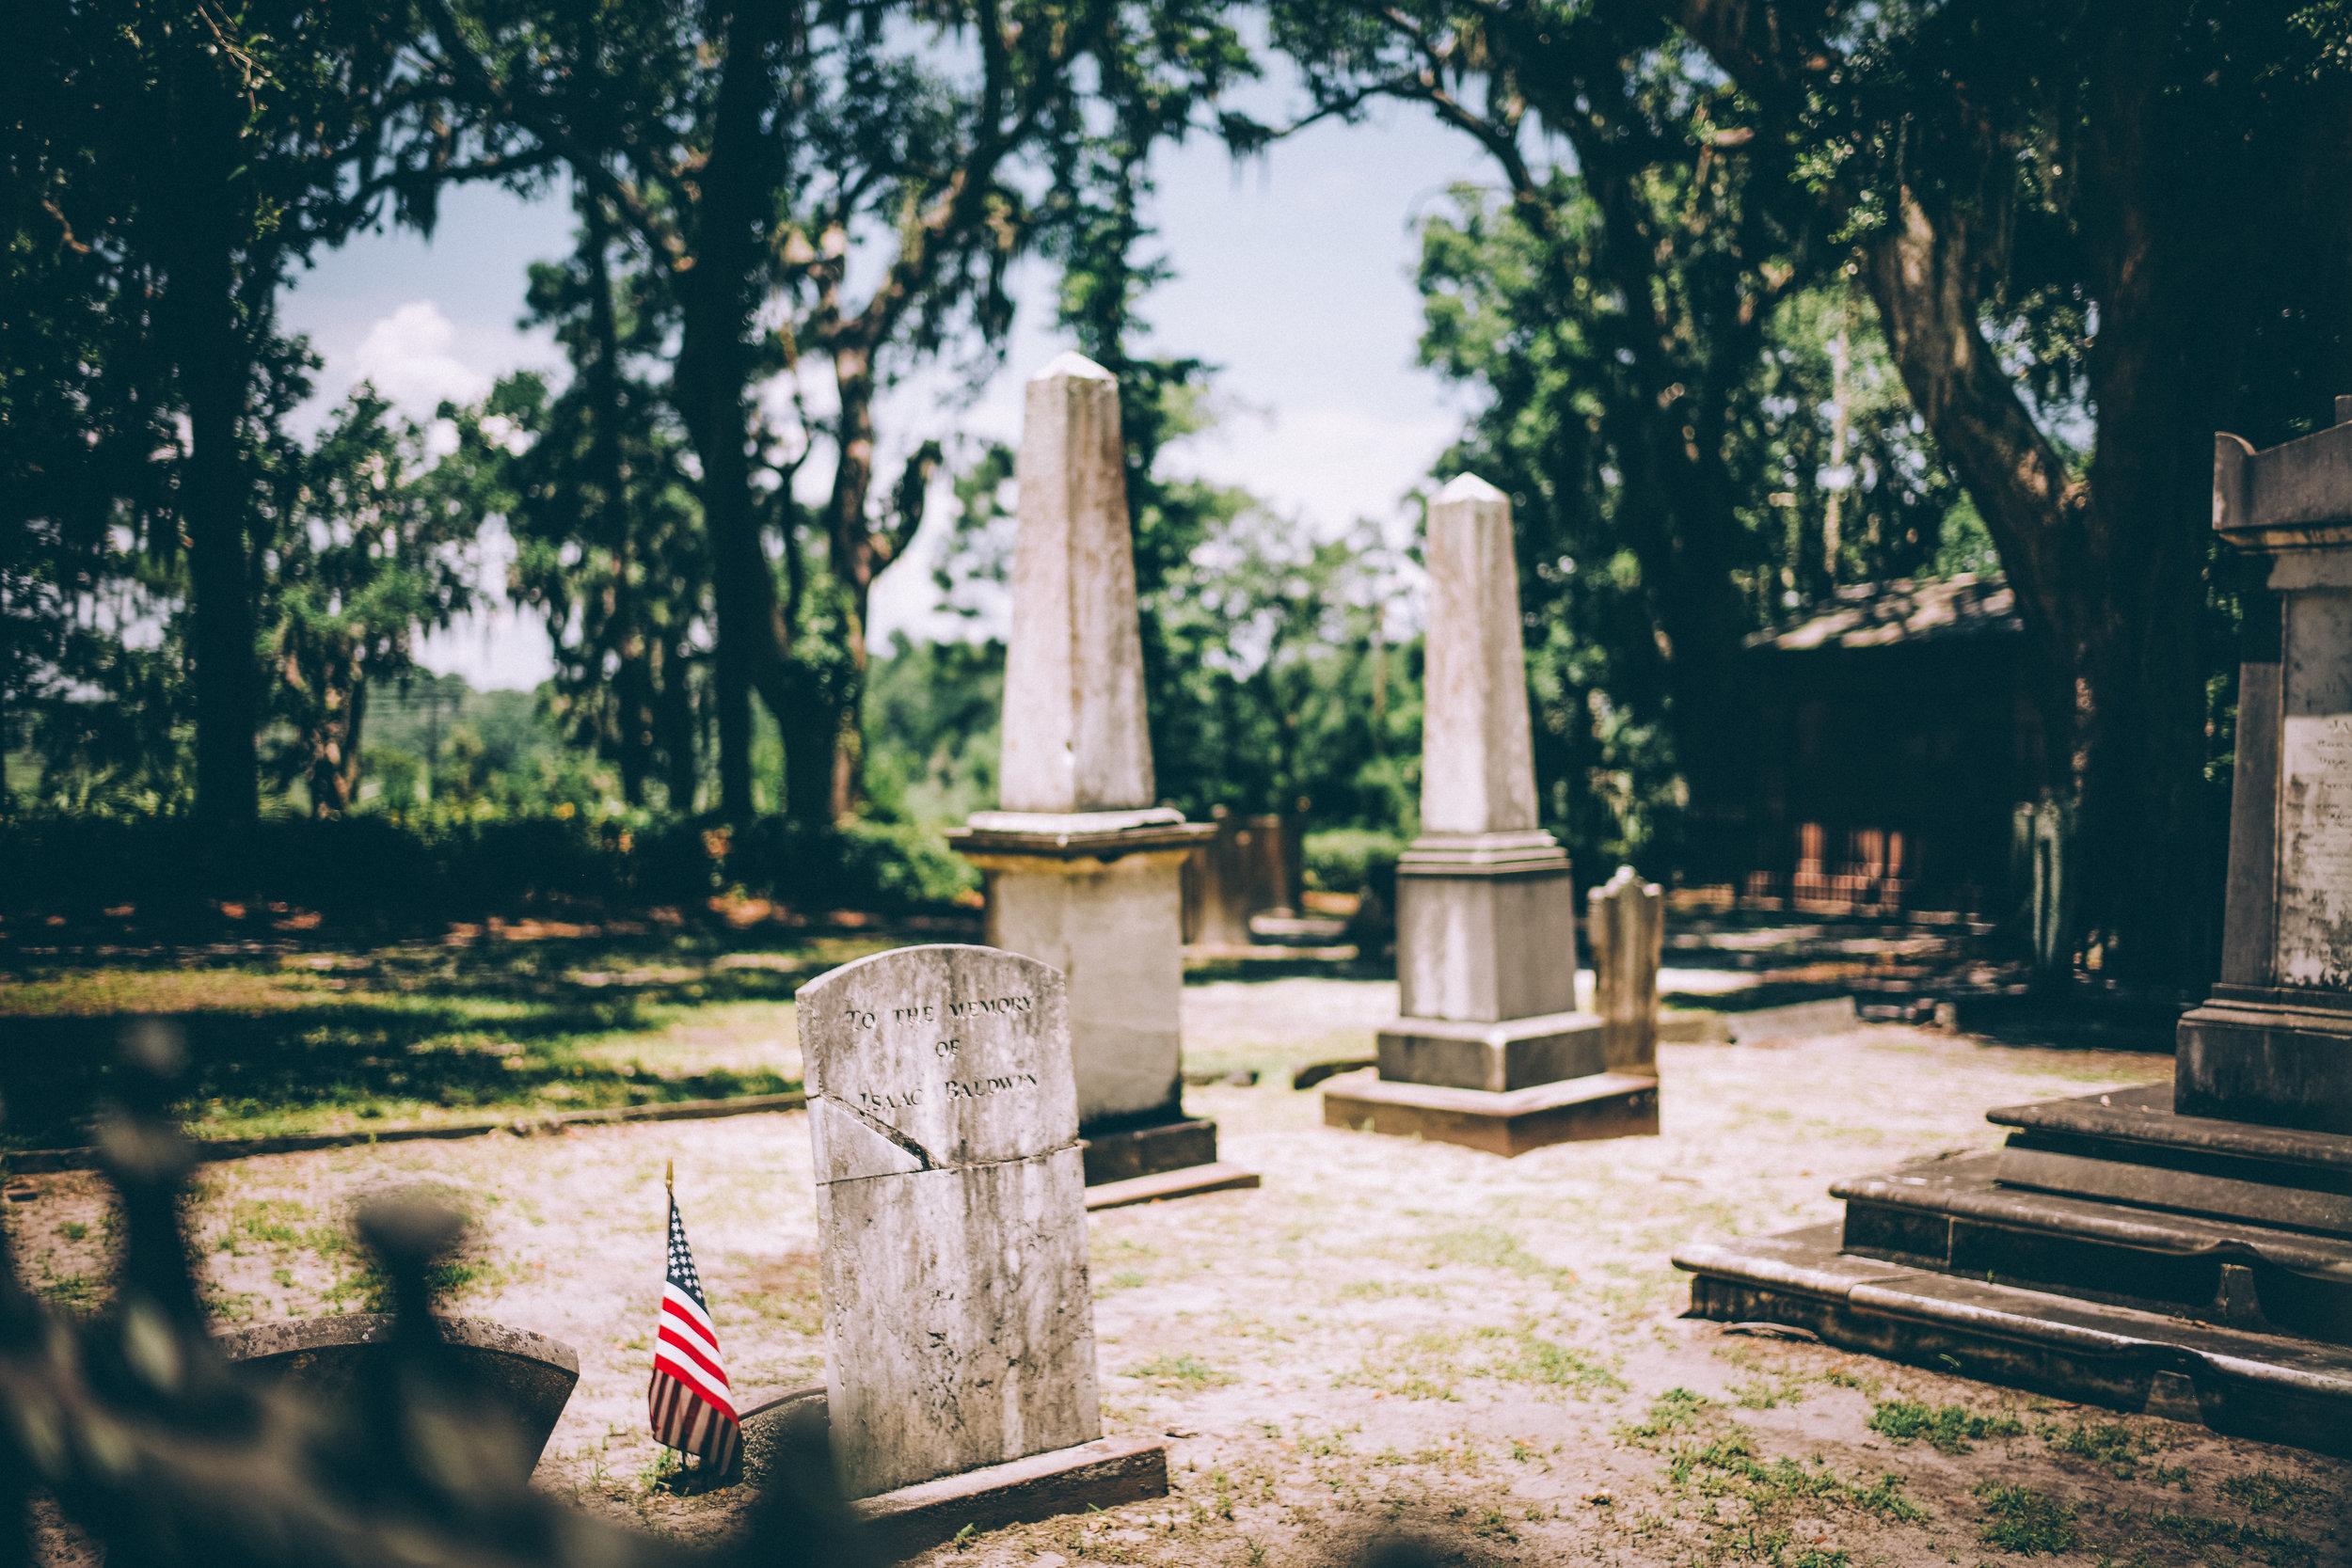 kw-zion-cemetery-sc-img5.jpg